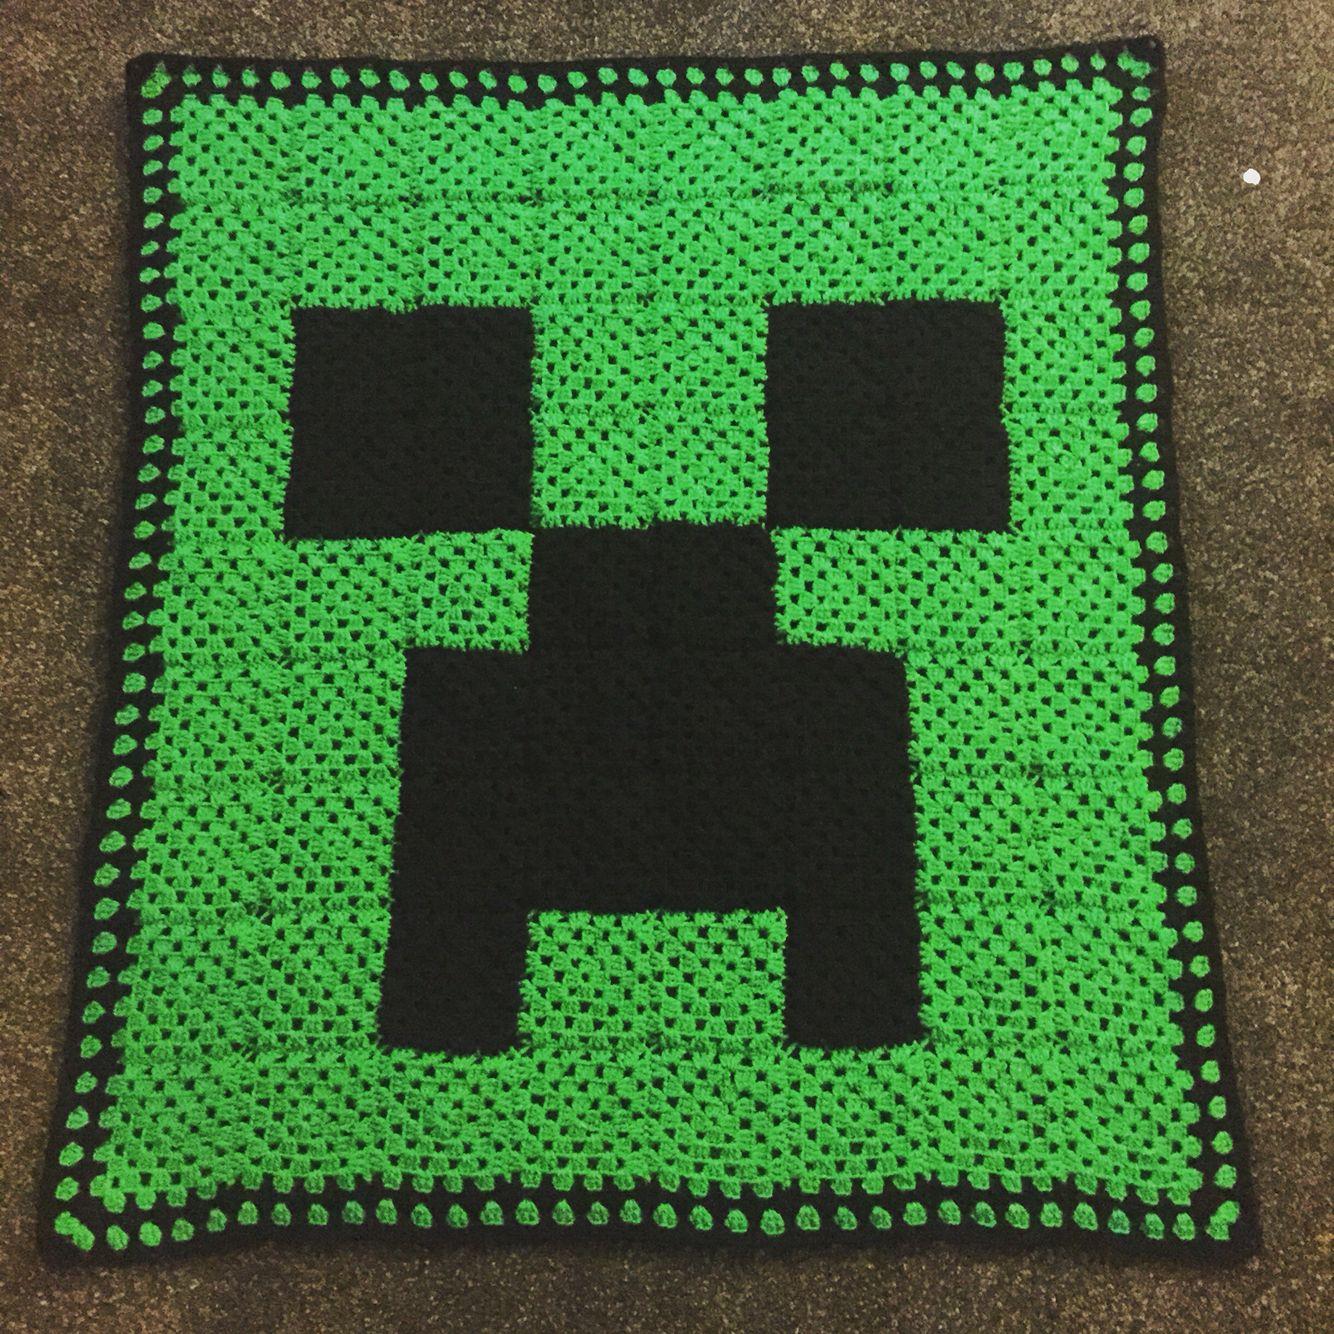 Granny Squares Minecraft Creeper Blanket Crochet Sewing Pinte Tm Diagram Ideas And Tips Juxtapost More